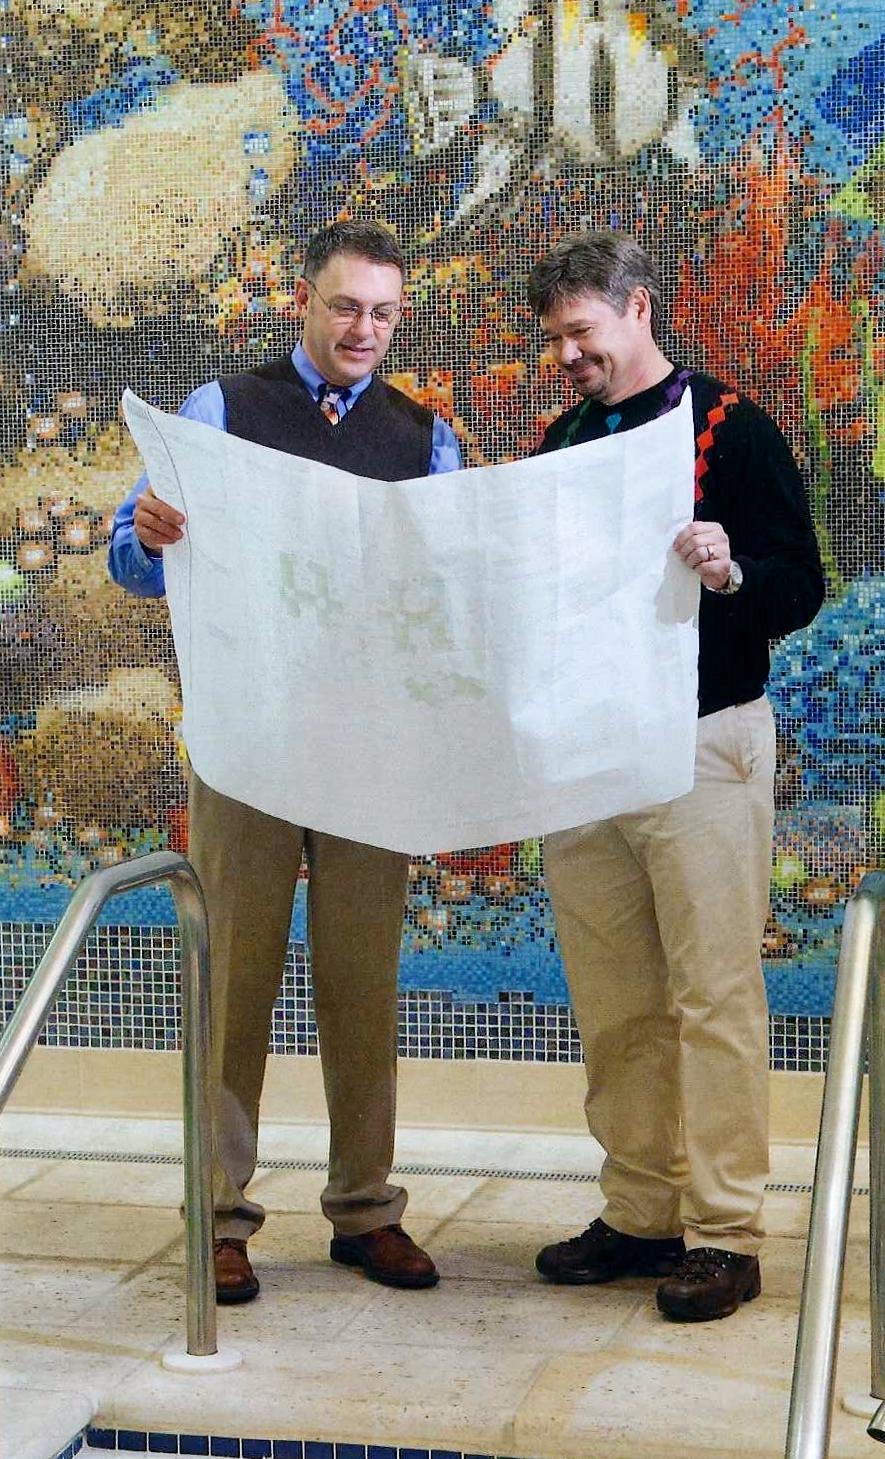 Cambridge/Davis architects look over plans